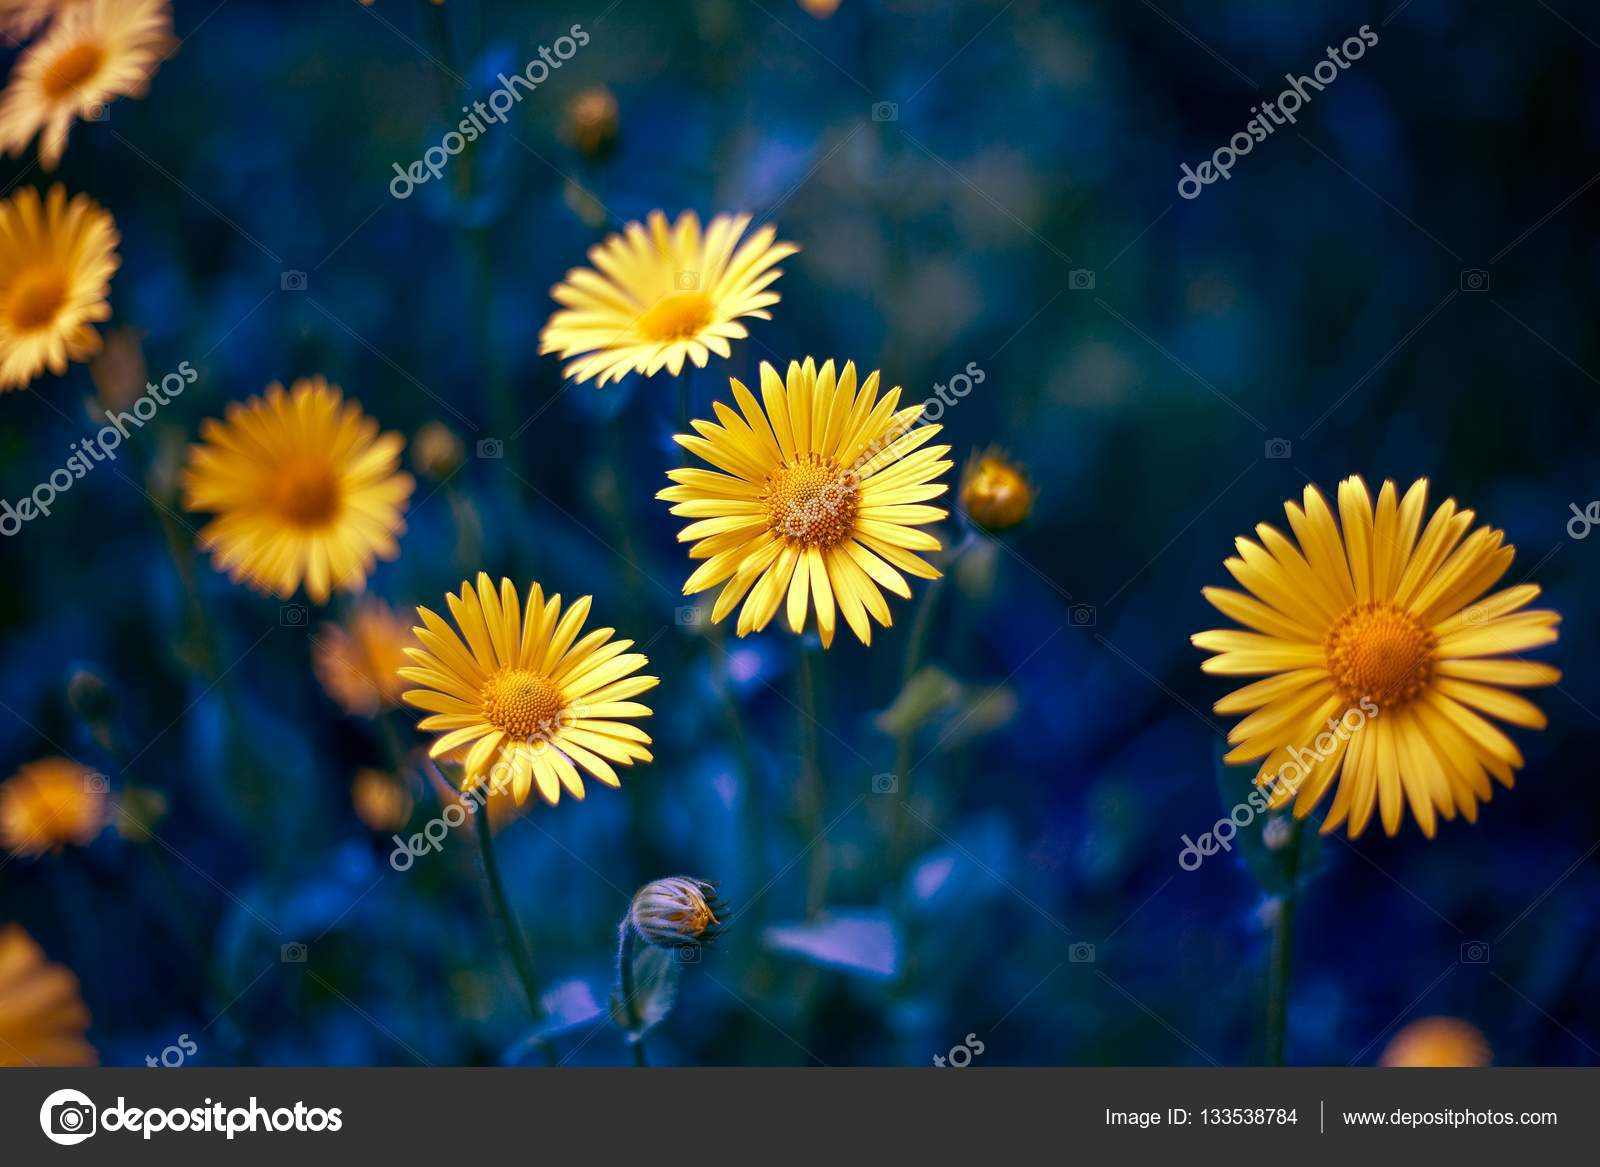 Camomile chamomel daisy chain wheel an aromatic european plant camomile chamomel daisy chain daisy wheel an aromatic european plant of the daisy family with white and yellow daisylike flowers photo by alexus izmirmasajfo